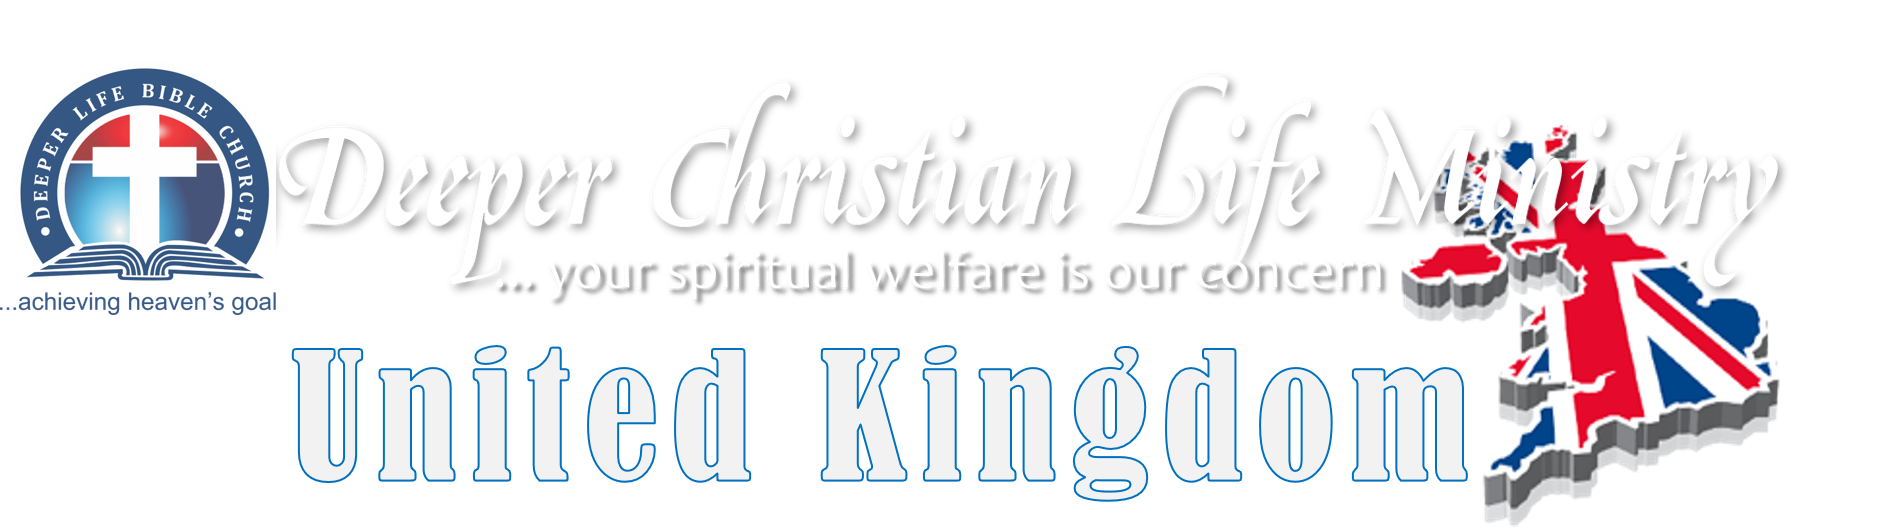 Deeper Christian Life Ministry, United Kingdom